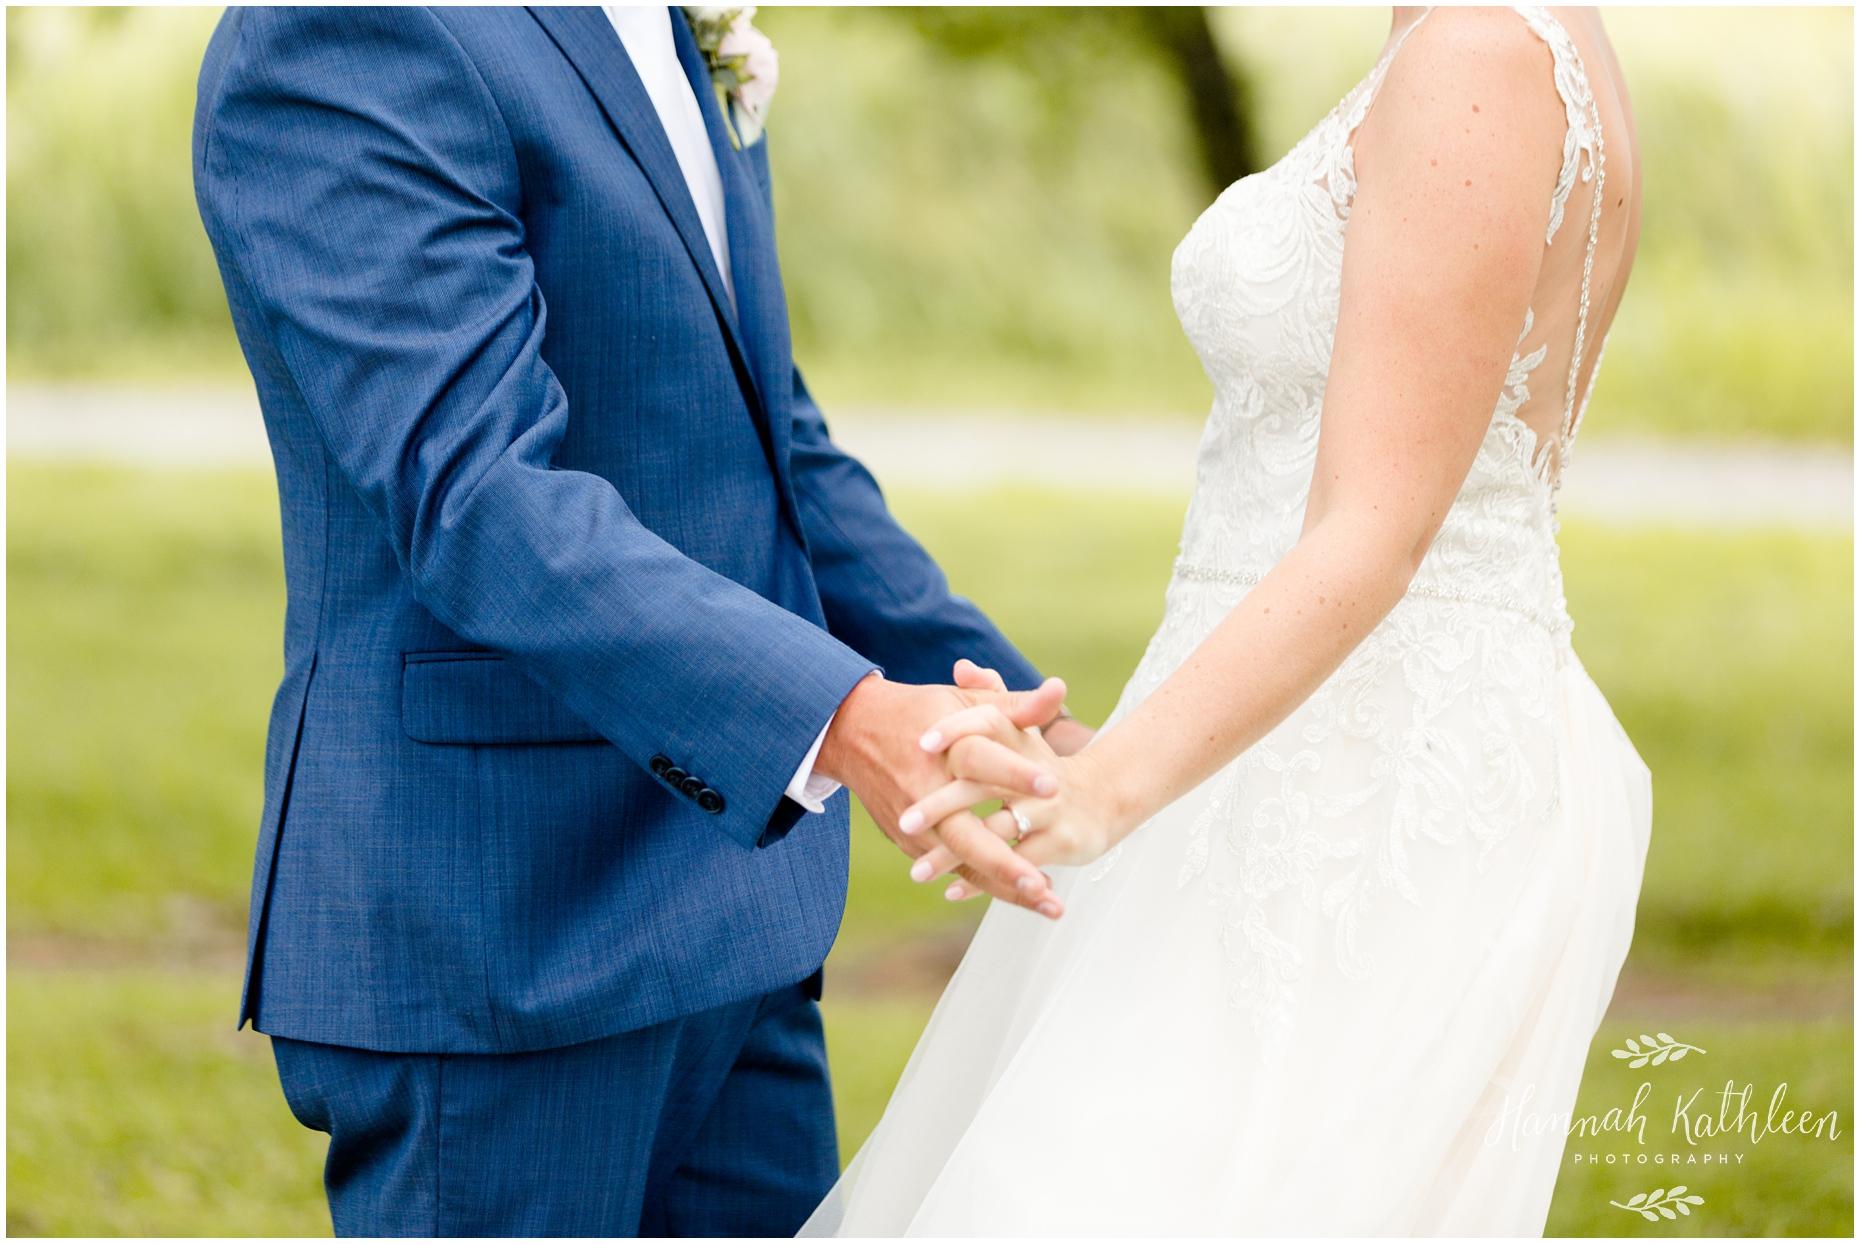 Mascia_Riverworks_Grand_Lady_Cruise_Intimate_Cobblestone_Tifft_covid_Wedding_Photography_Buffalo_New_York